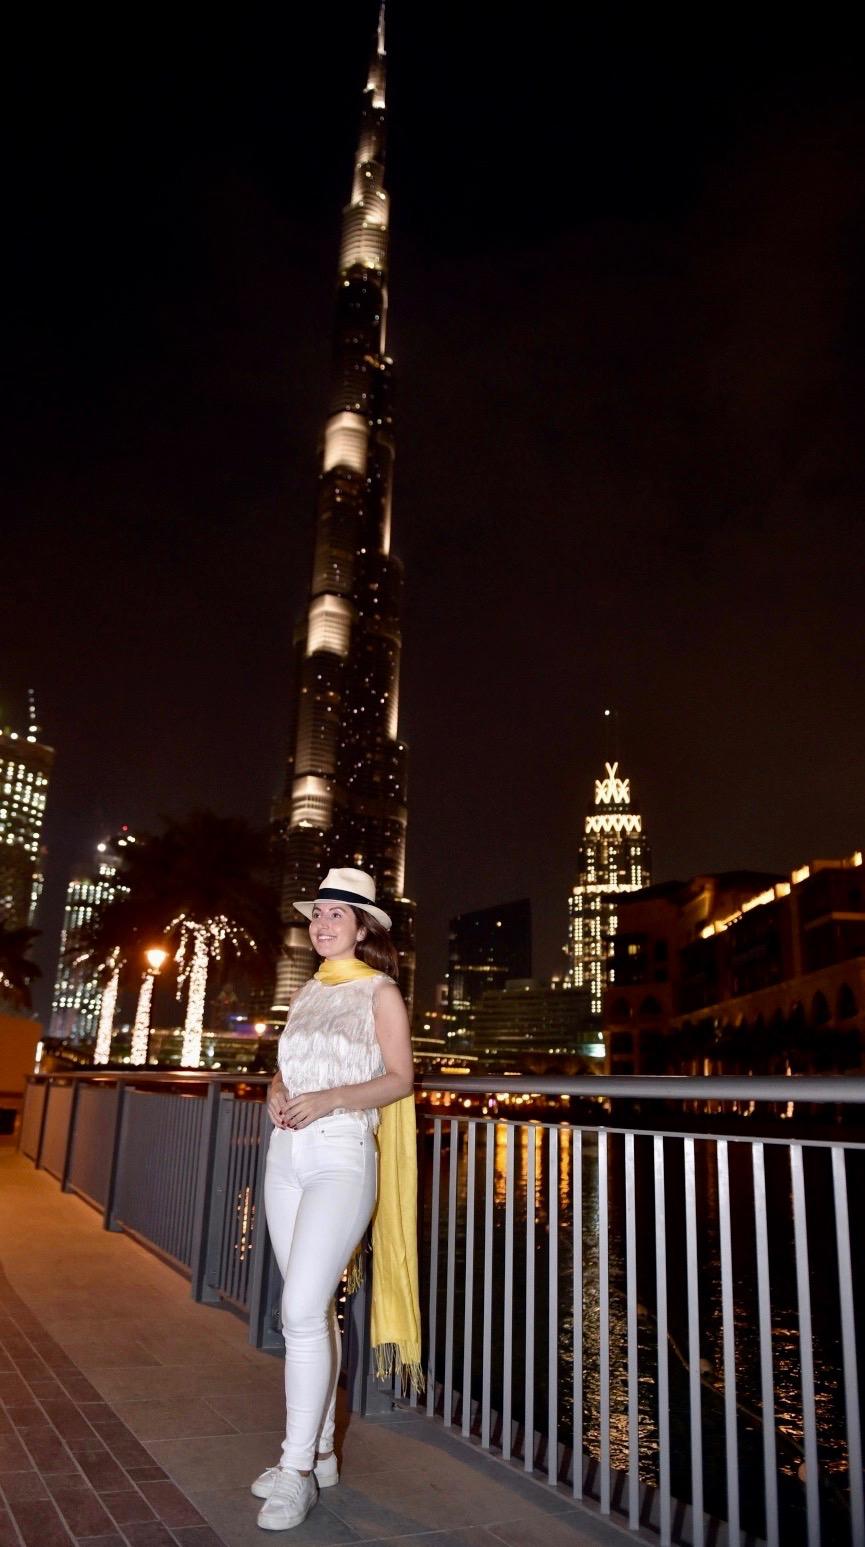 BURJ KHALIFA • DUBAI, UAE PHOTOGRAPHER: ALI AJAME